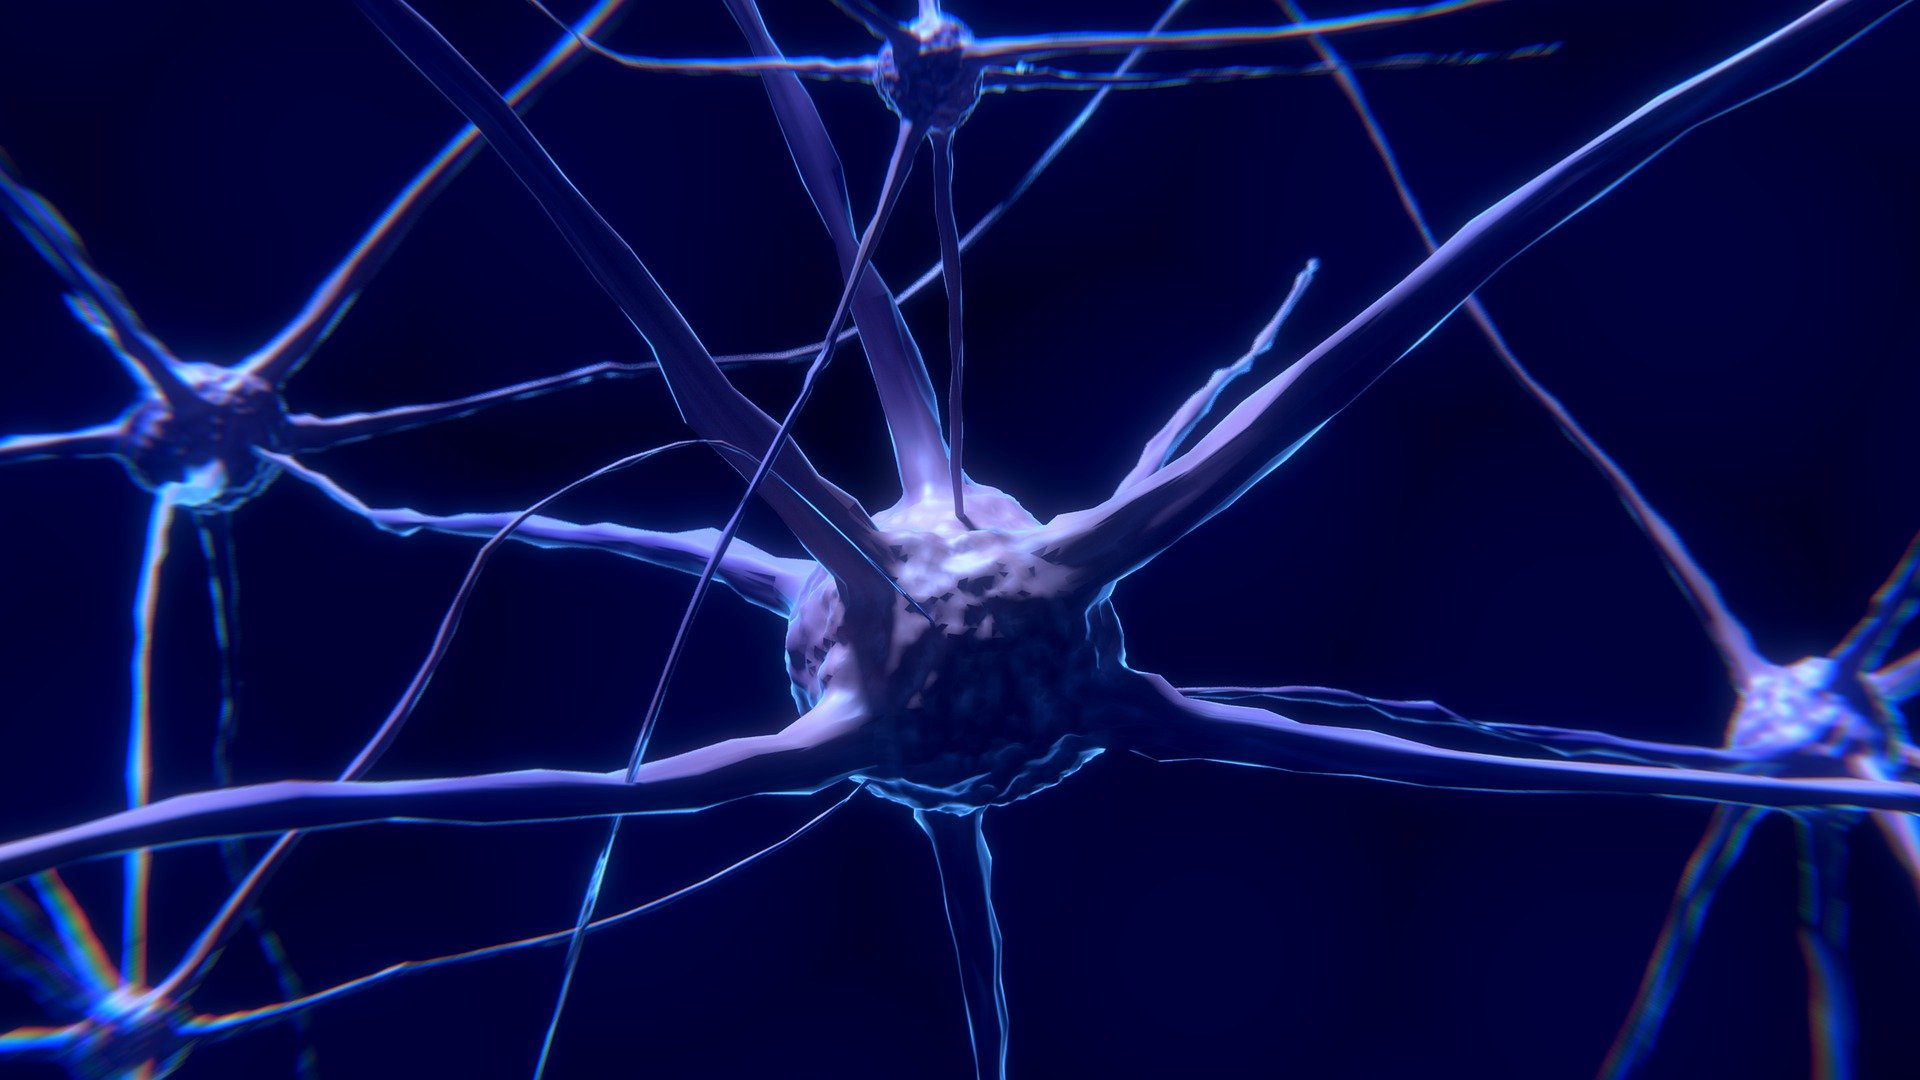 nerve-cells-2213009_c_colin-behrens_pixabay